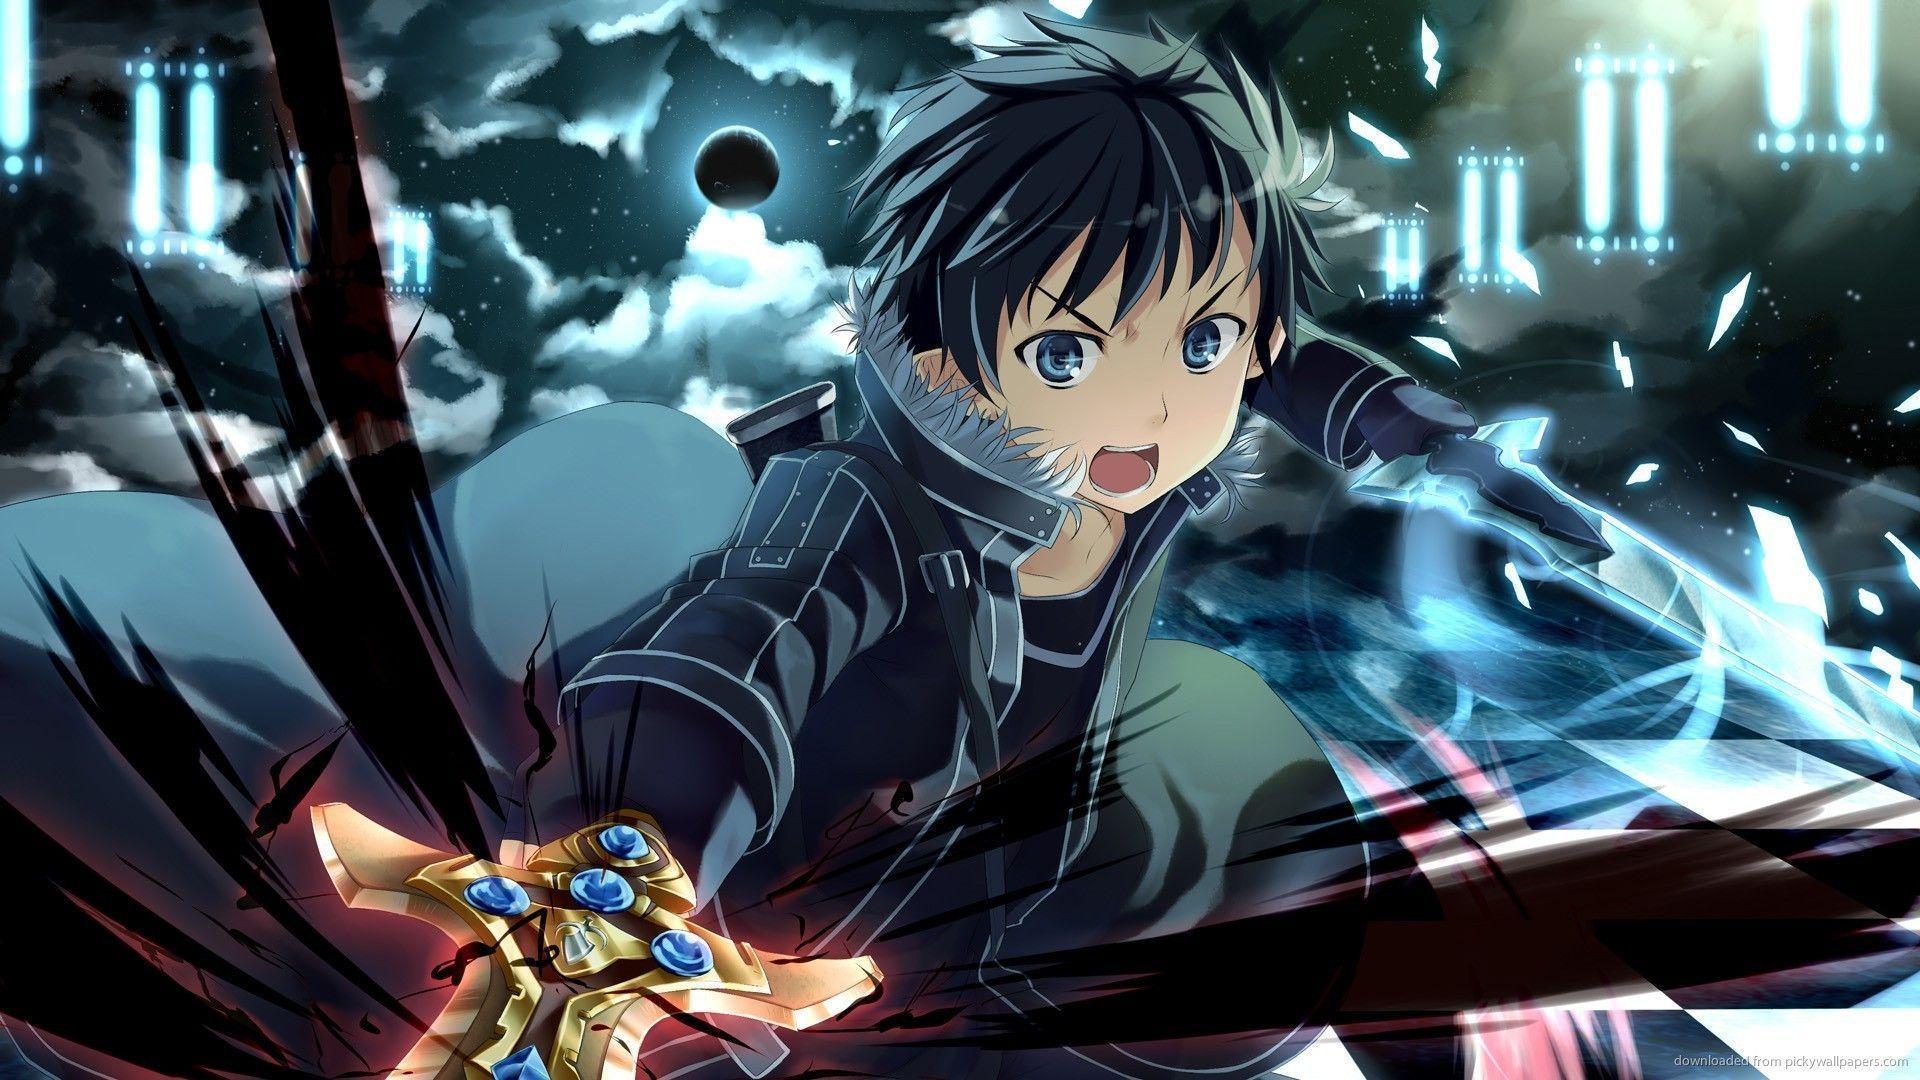 Anime Wallpapers   Data-src /img/44157 - Anime Wallpaper 1920x1080 Hd - HD Wallpaper